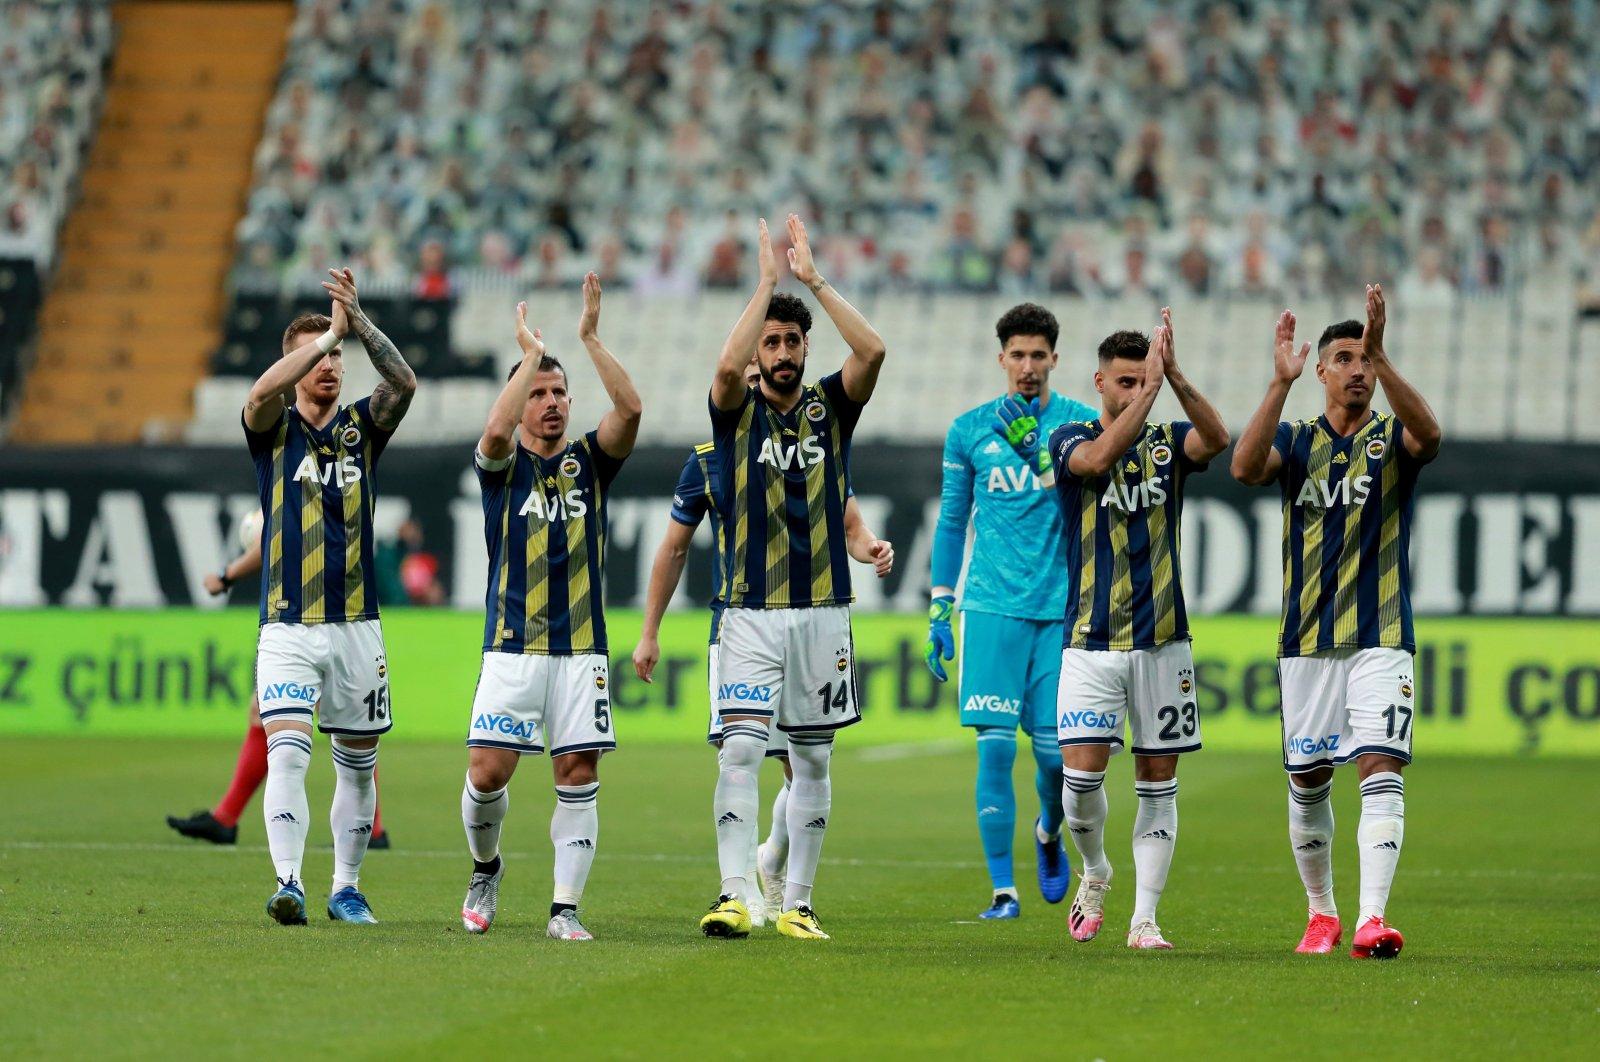 Fenerbahçe players react after a Süper Lig match against Beşiktaş in Istanbul, Turkey, July 24, 2020. (AA Photo)